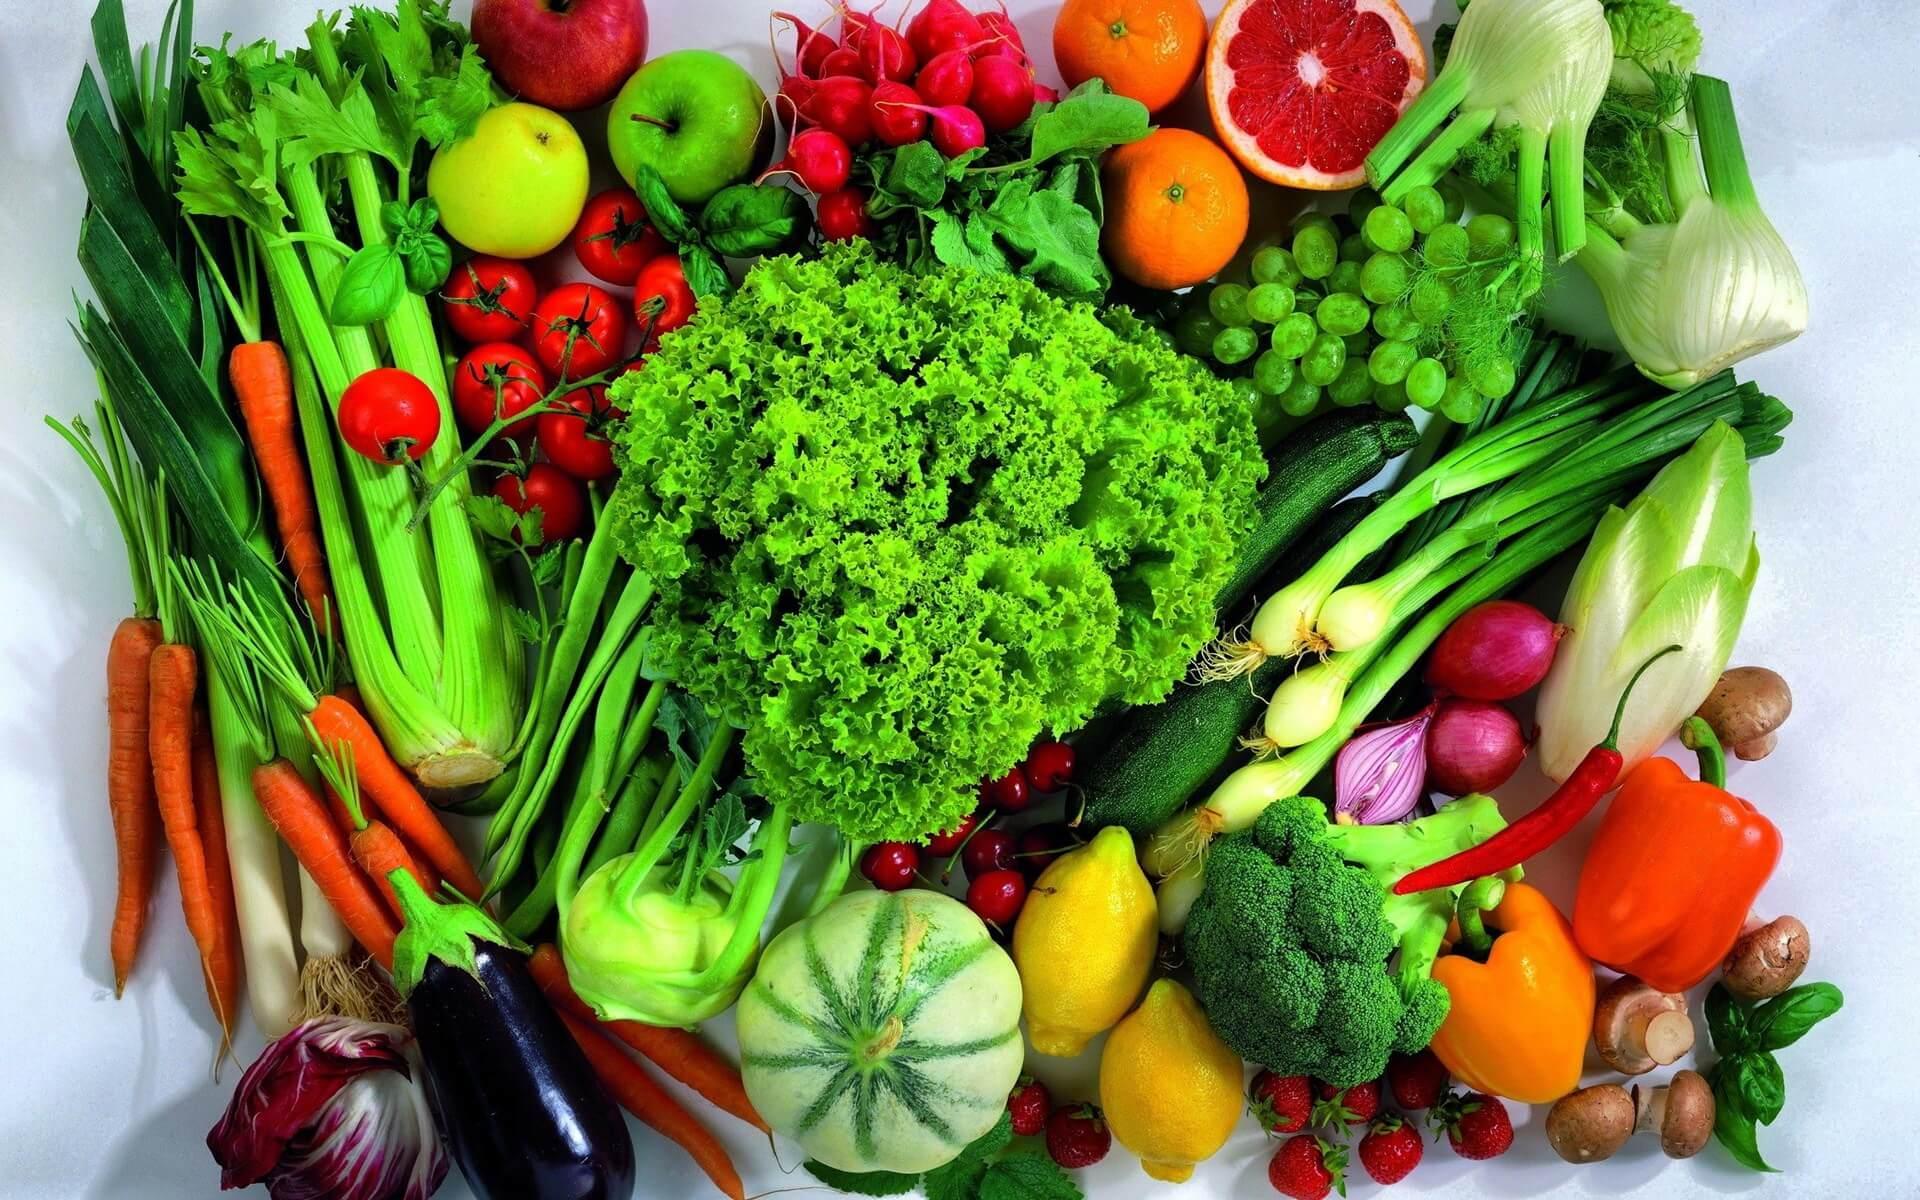 diéta puffadásra 9 hónapos étrendje